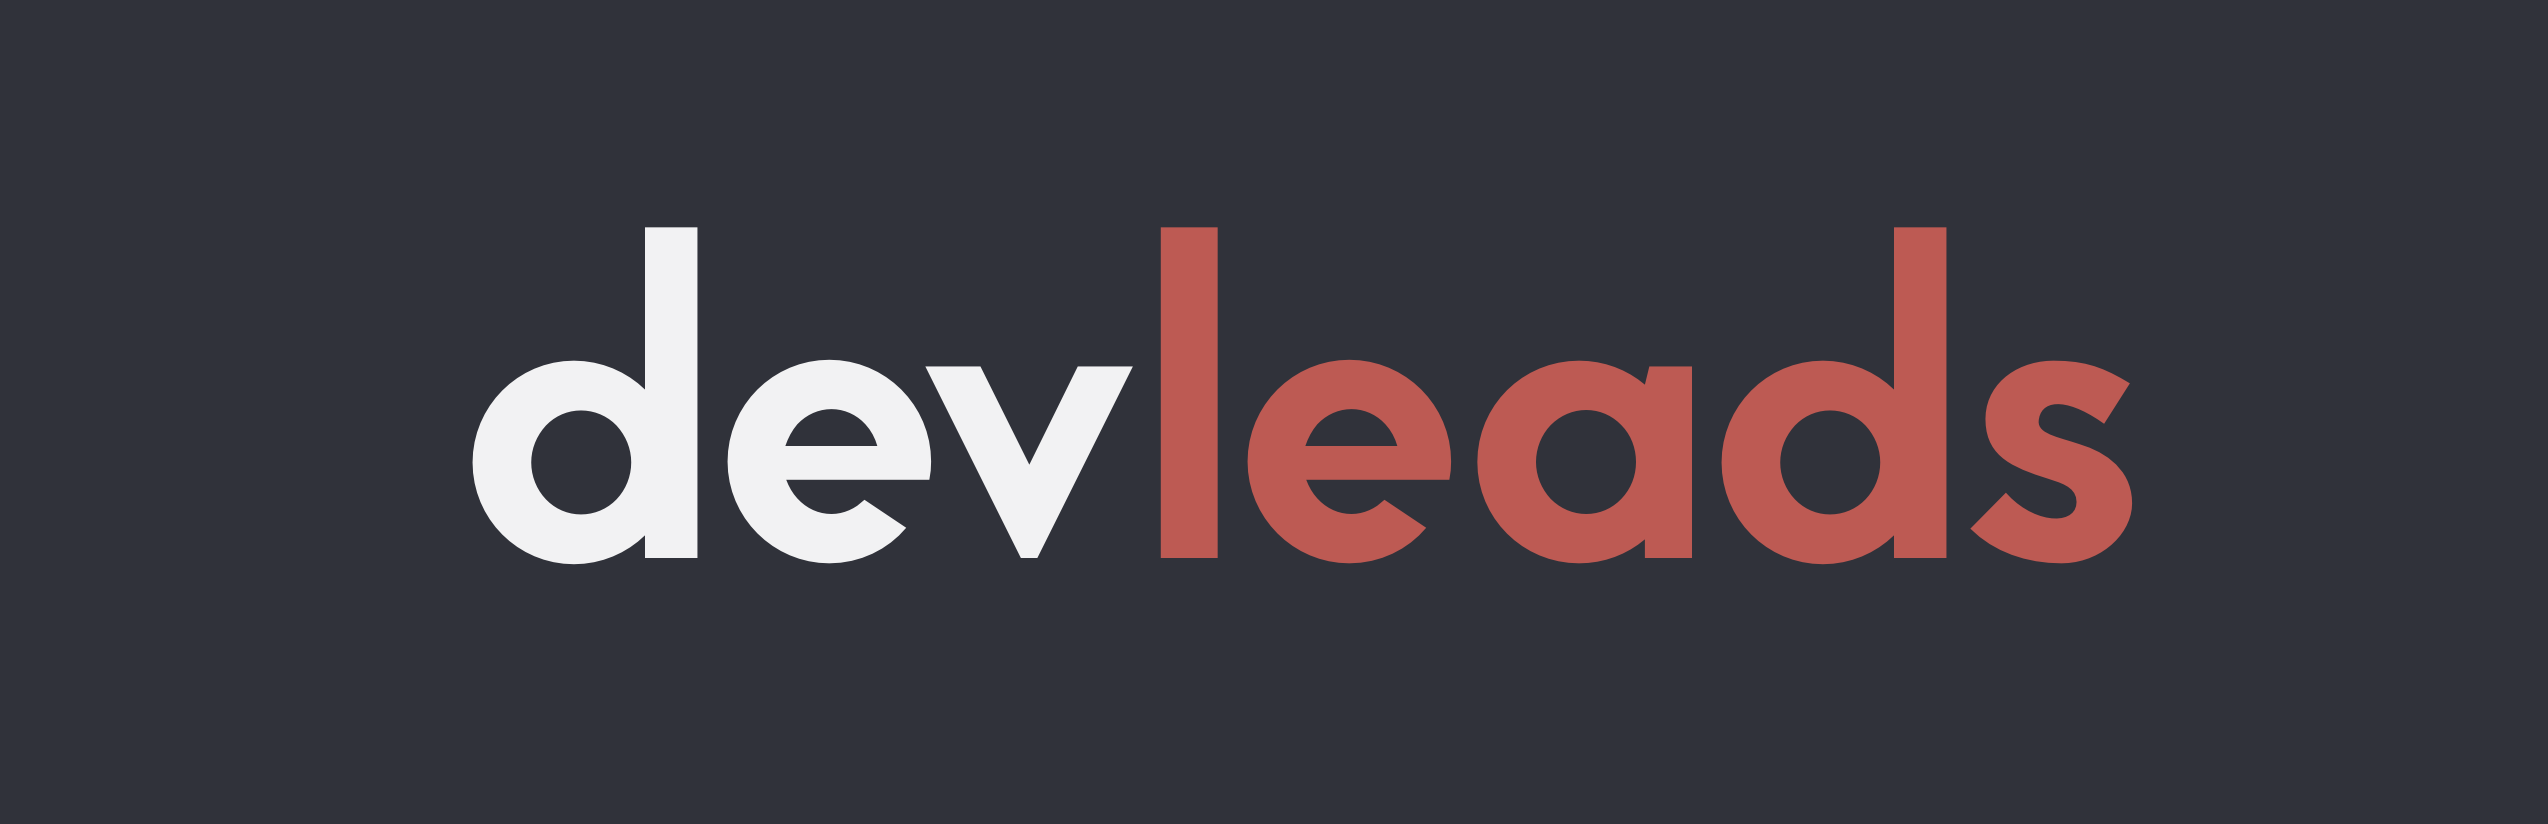 devleads — (не)финансовая мотивация - 7